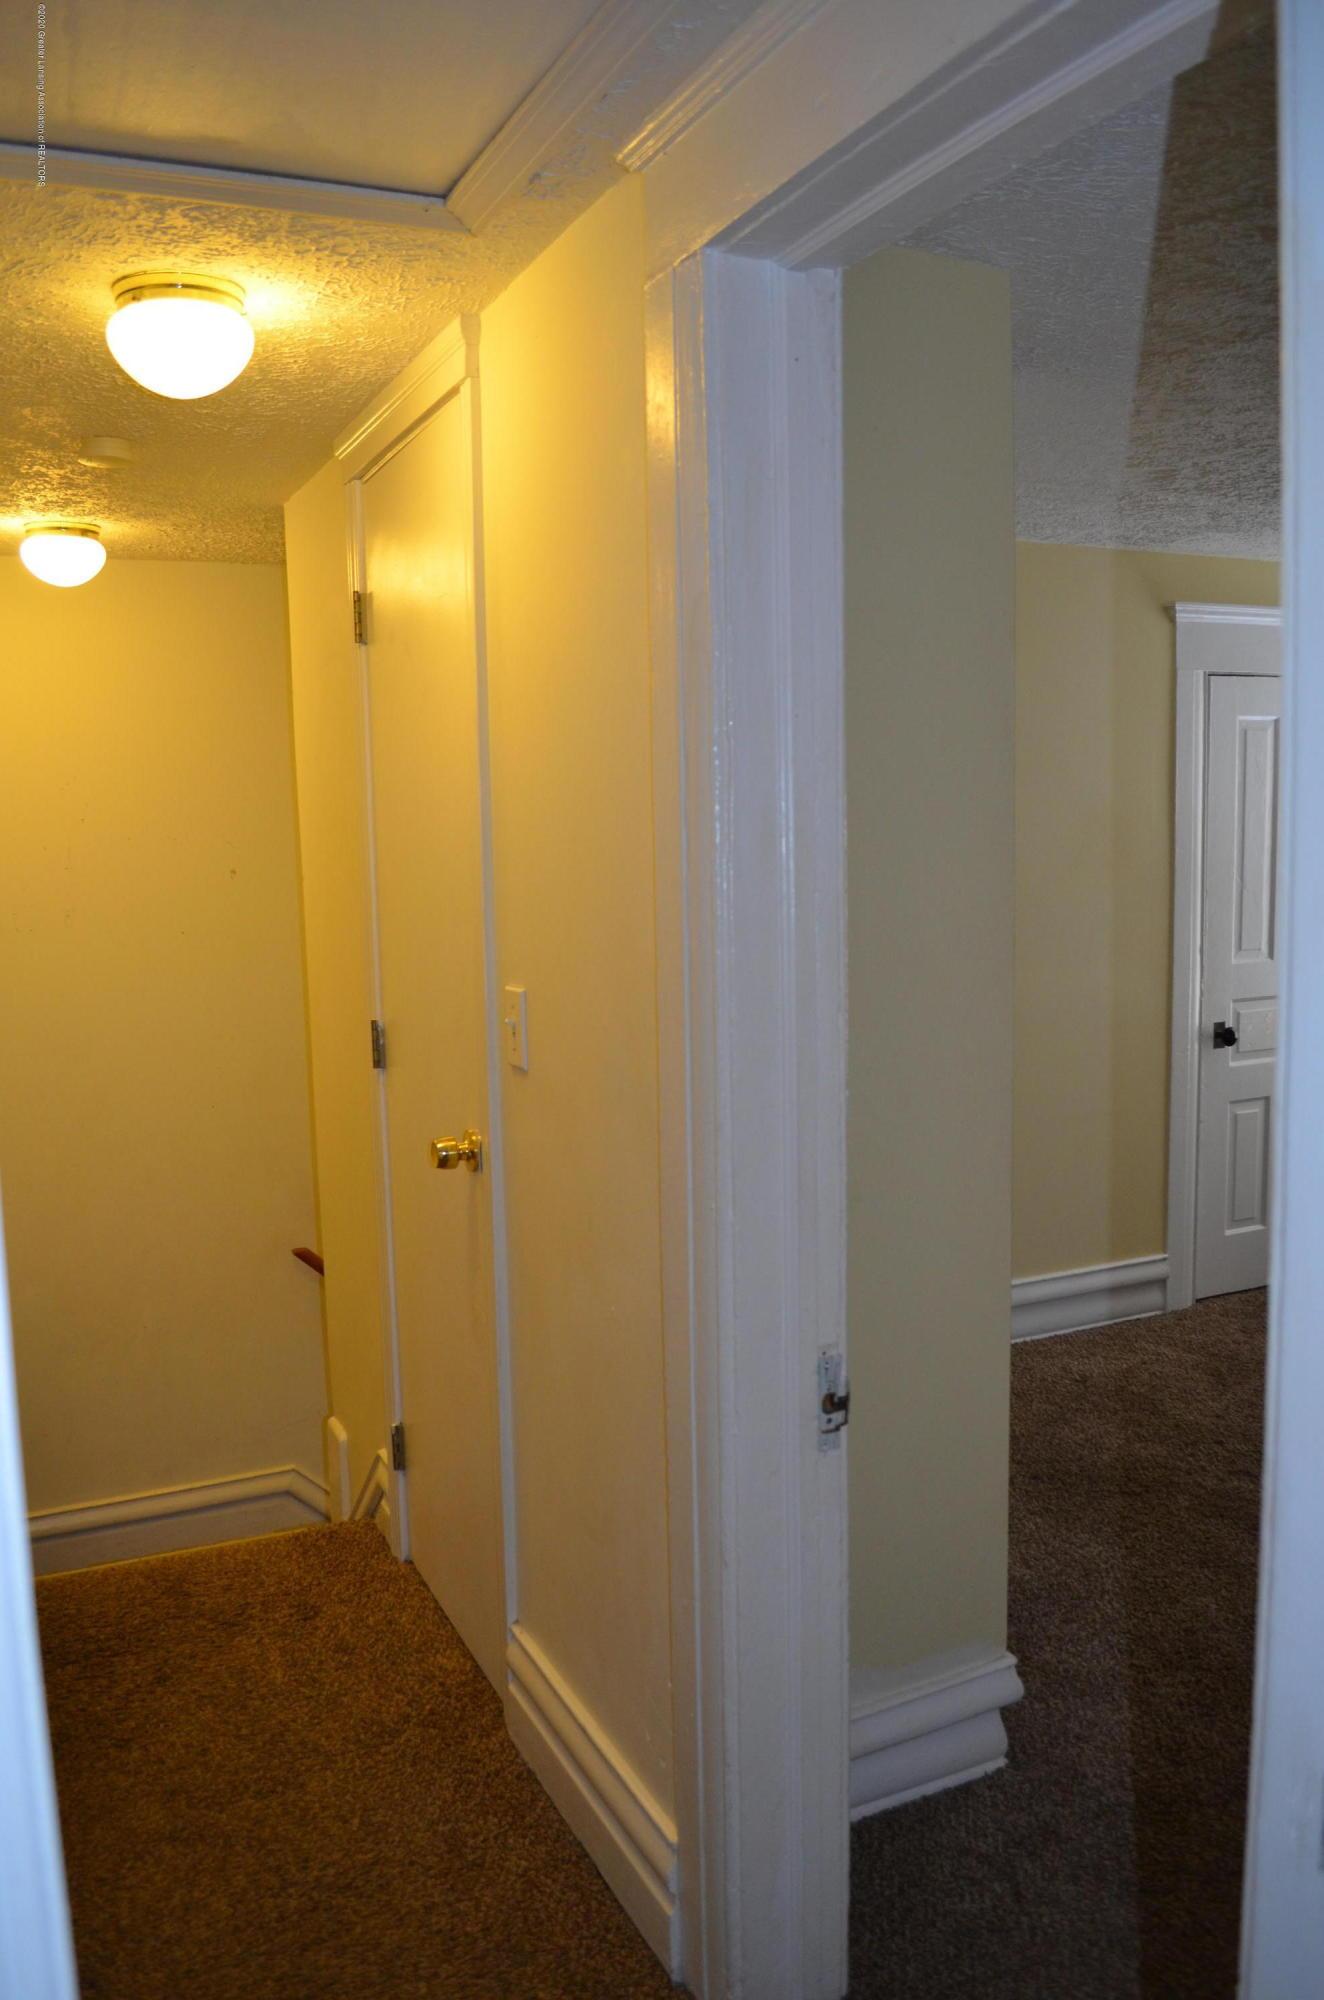 1222 W Ionia St - 2nd Floor Hallway - 20